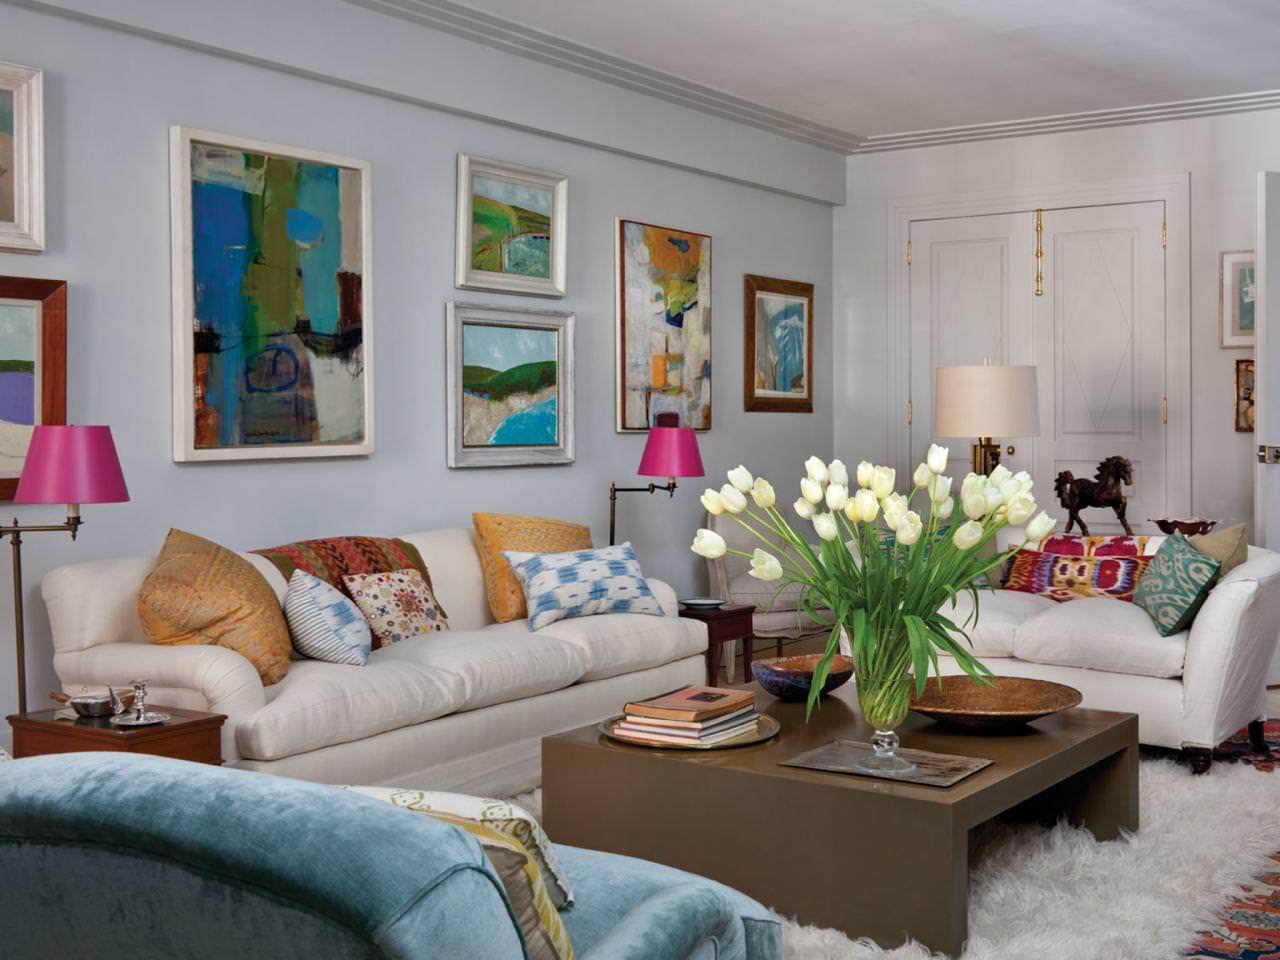 27 eclectic living room designs decorating ideas design trends. Black Bedroom Furniture Sets. Home Design Ideas